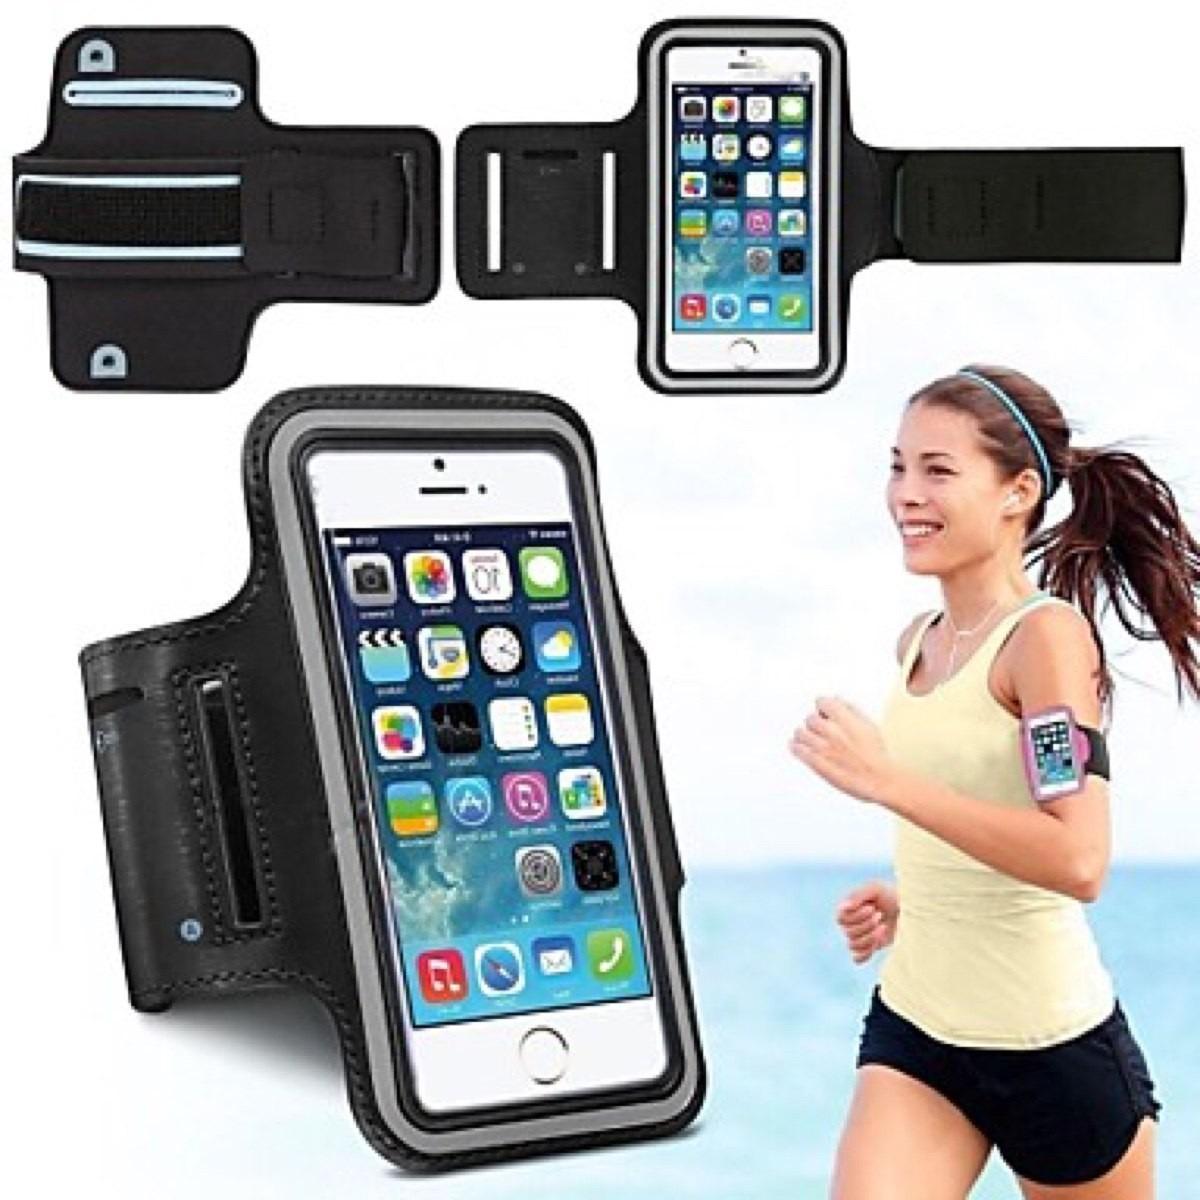 0de88abbea5 brazalete deportivo frieq para correr ejercicio - iphone 7 8. Cargando zoom.